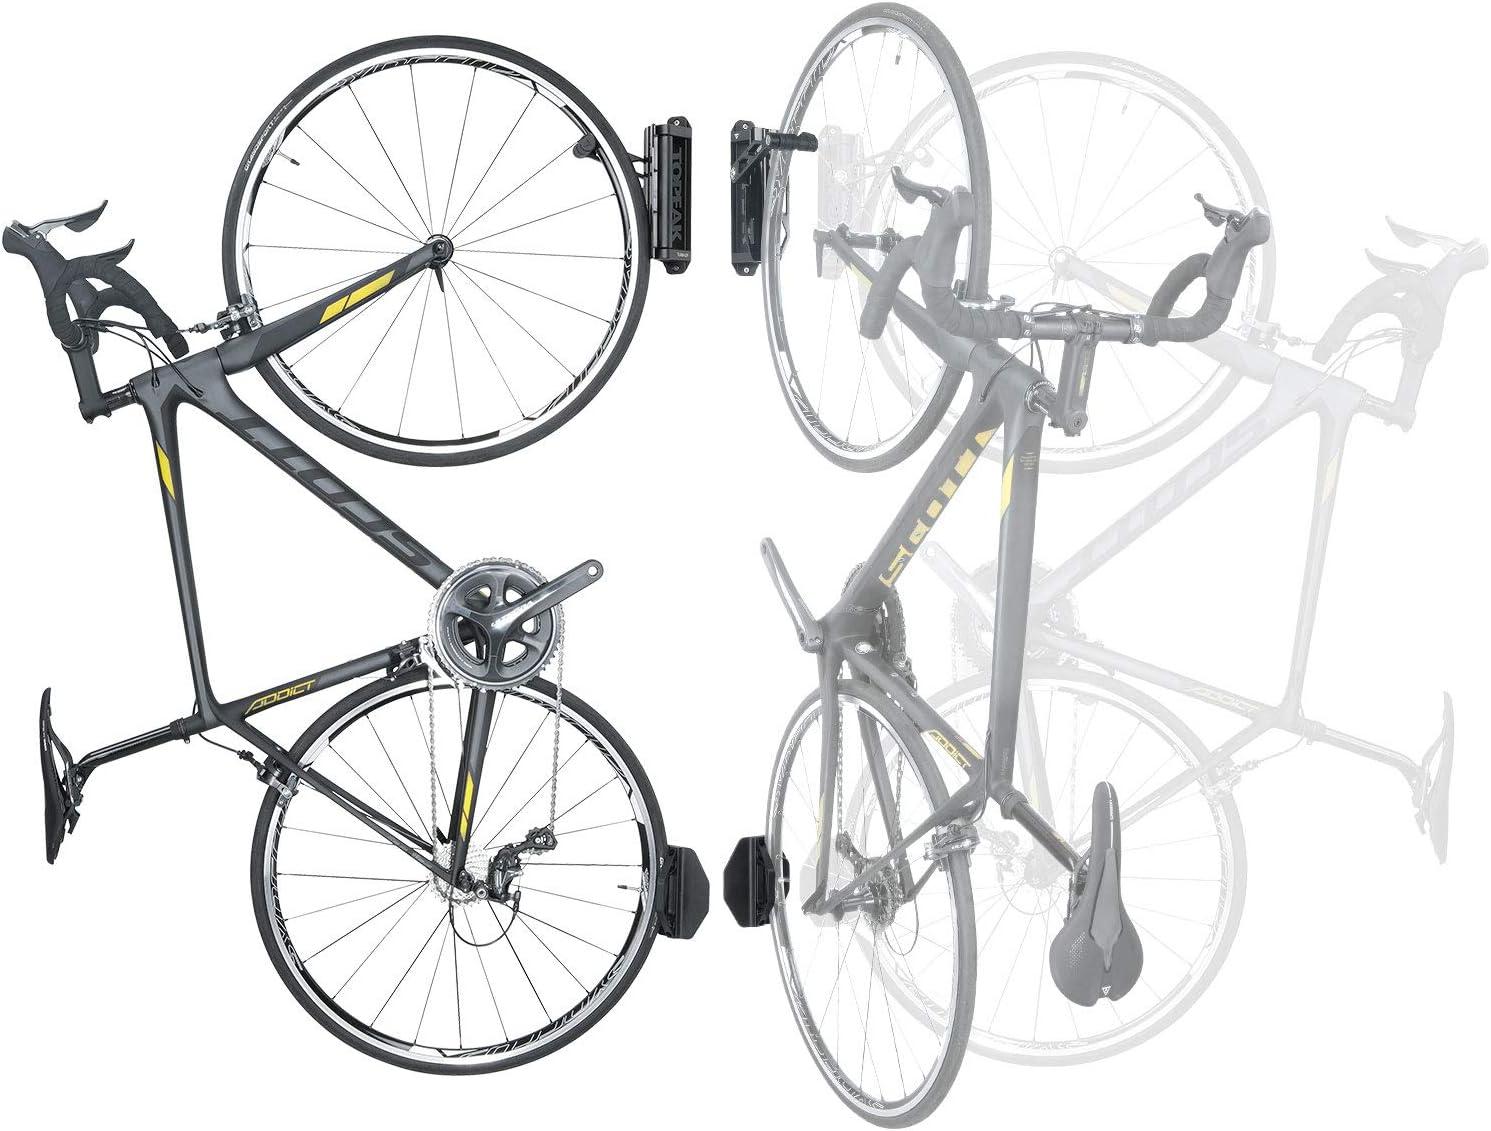 "Topeak Swing-Up Bike Holder Black, 27.5 x 16 x 7.7 cm / 10.8"" x 6.3"" x 3"""